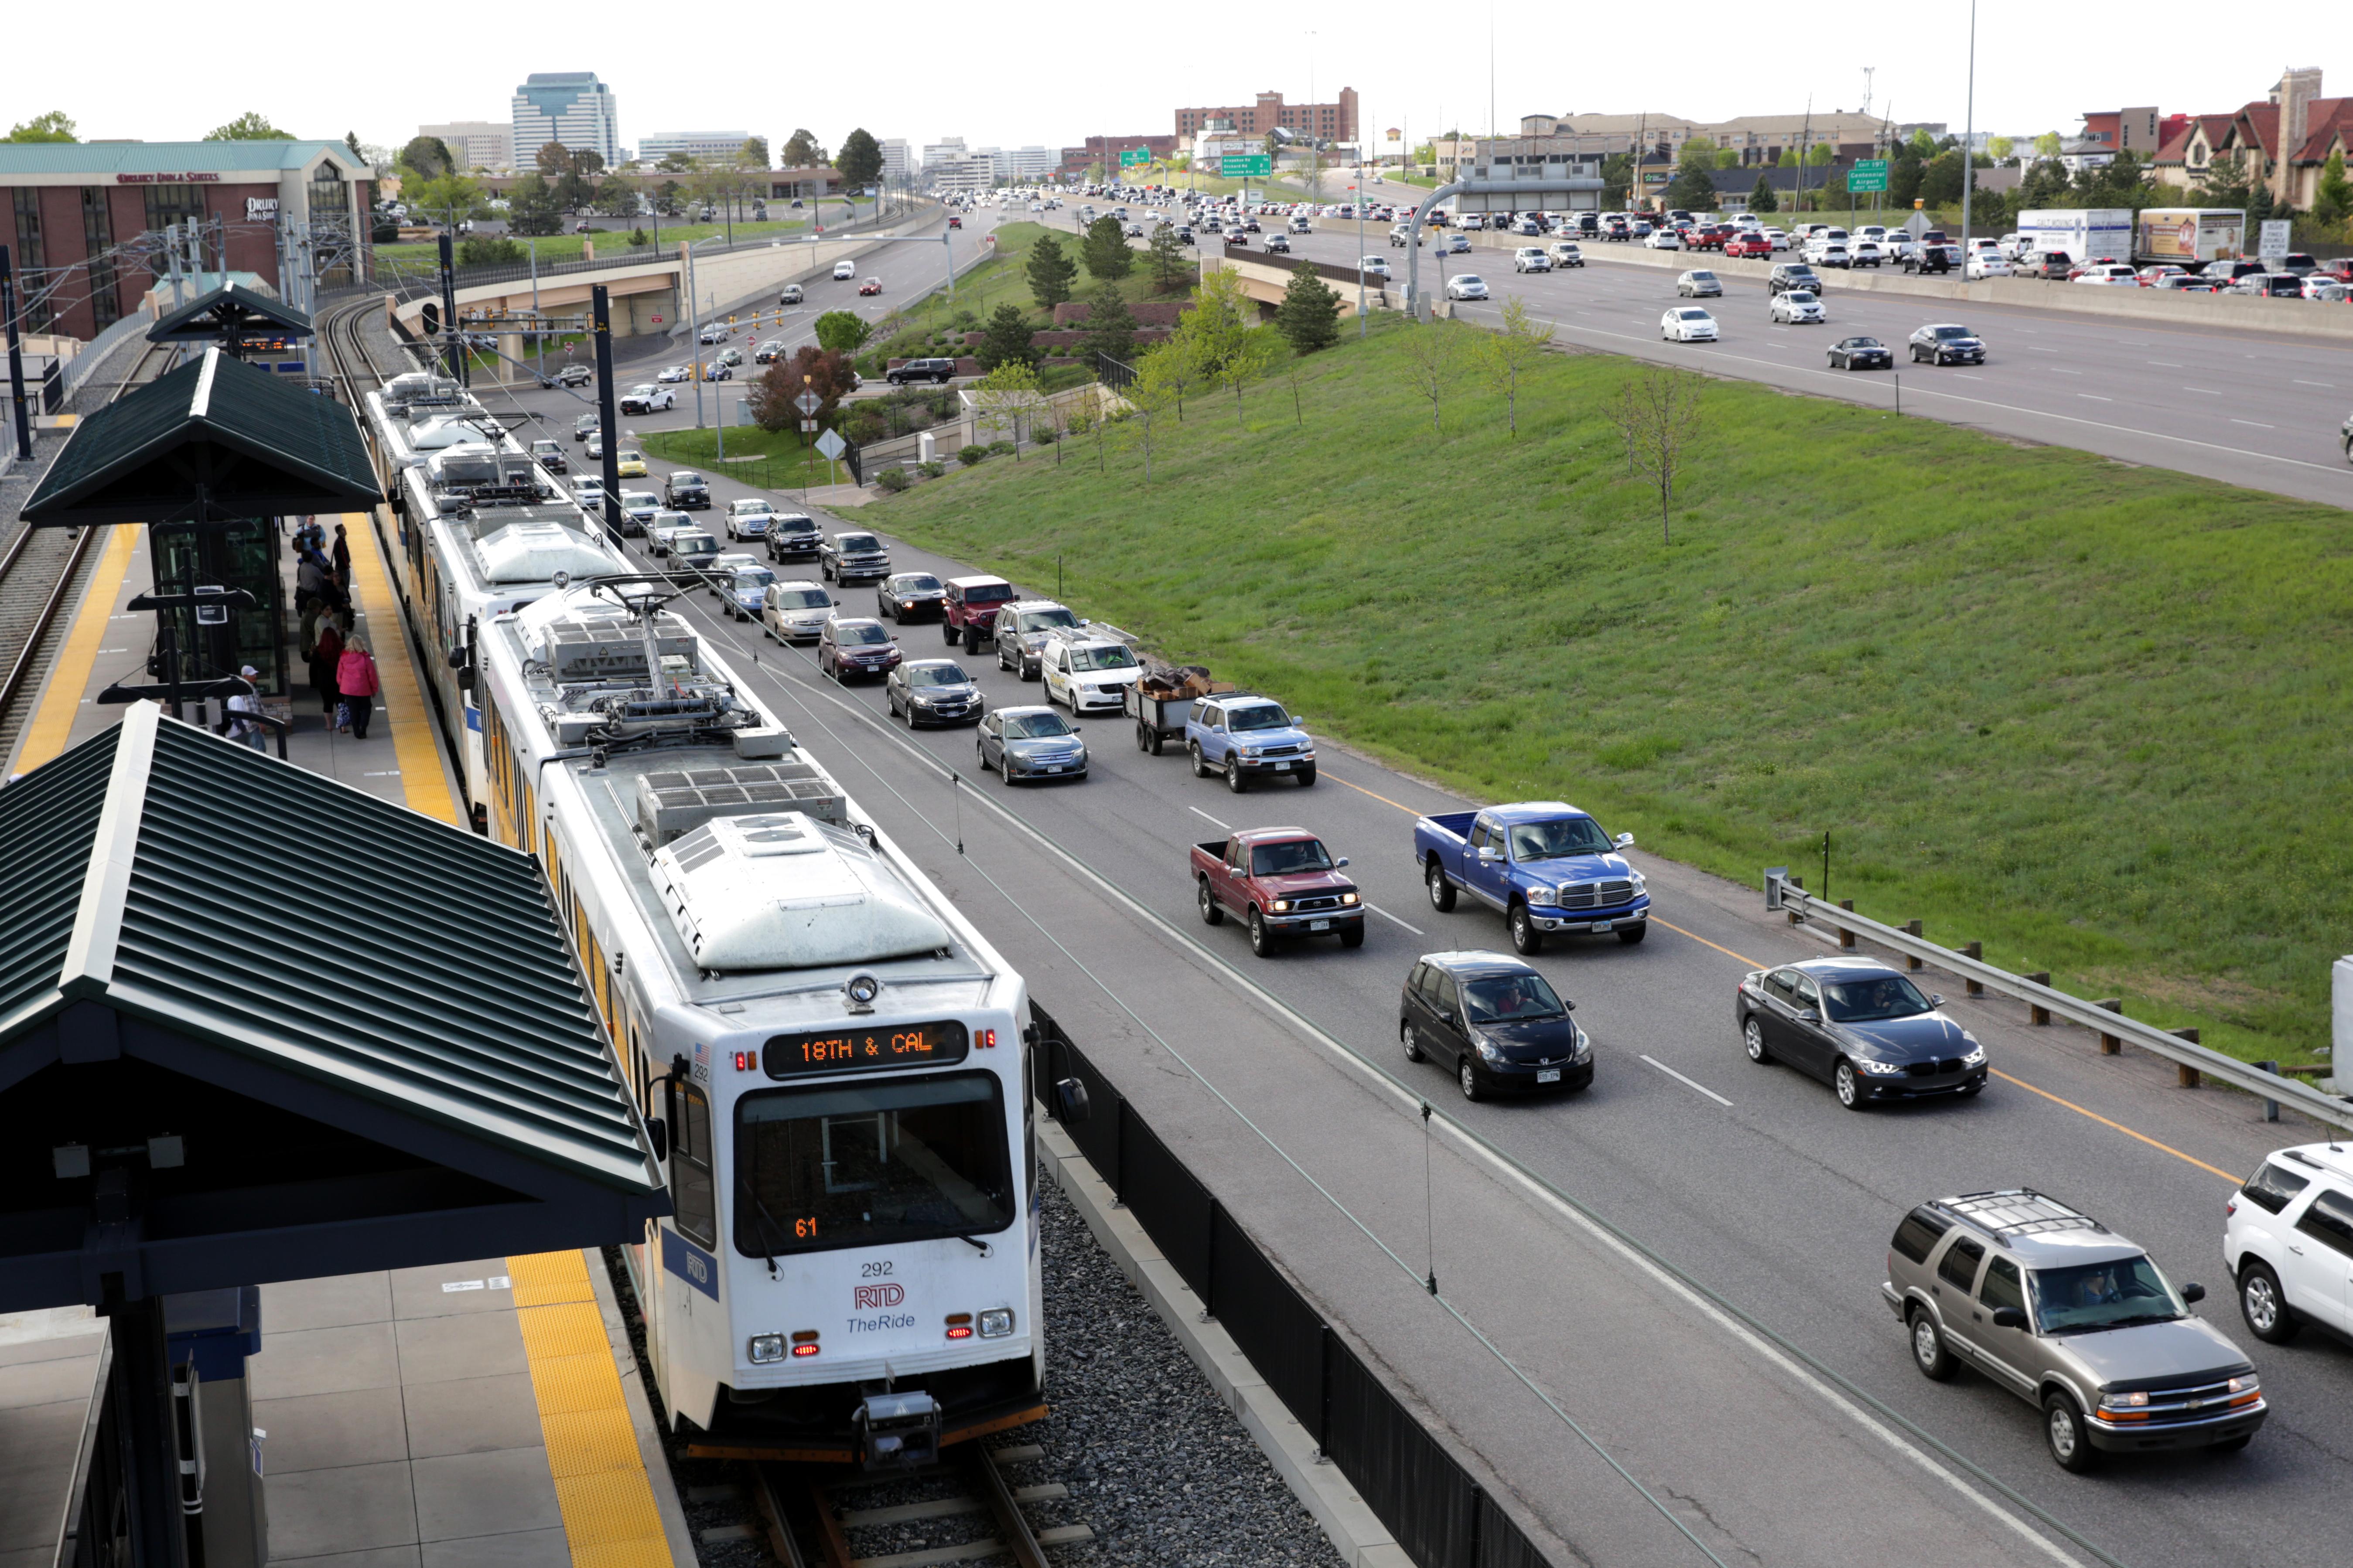 RTD's Dry Creek light rail station is adjacent to Interstate 25 south of Denver.